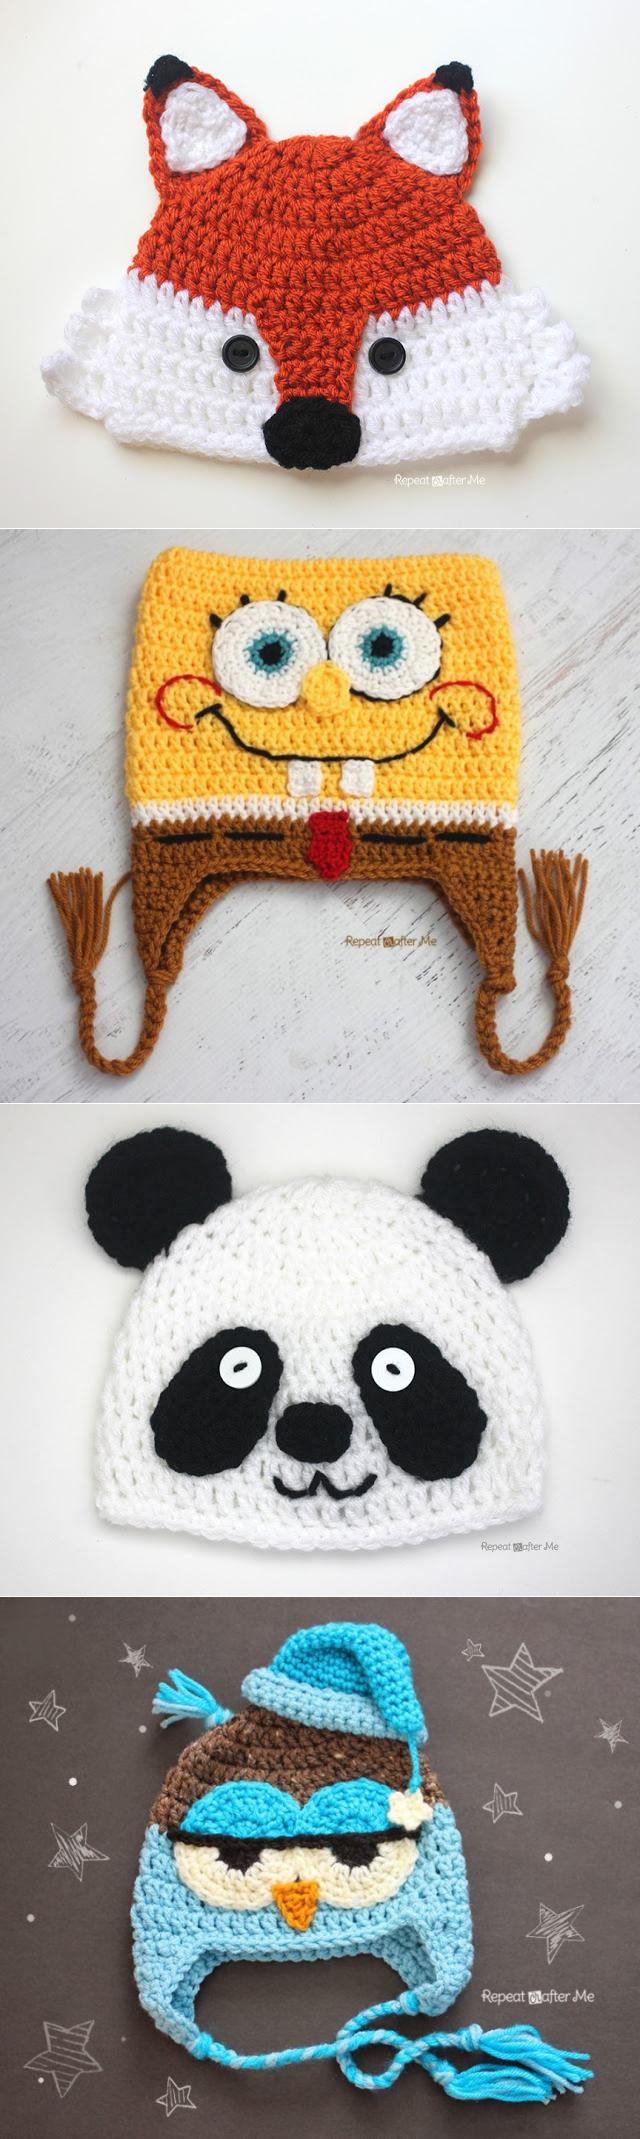 Вязание шапочек крючком,спицами | Hats | Pinterest | Gorros, Tejido ...